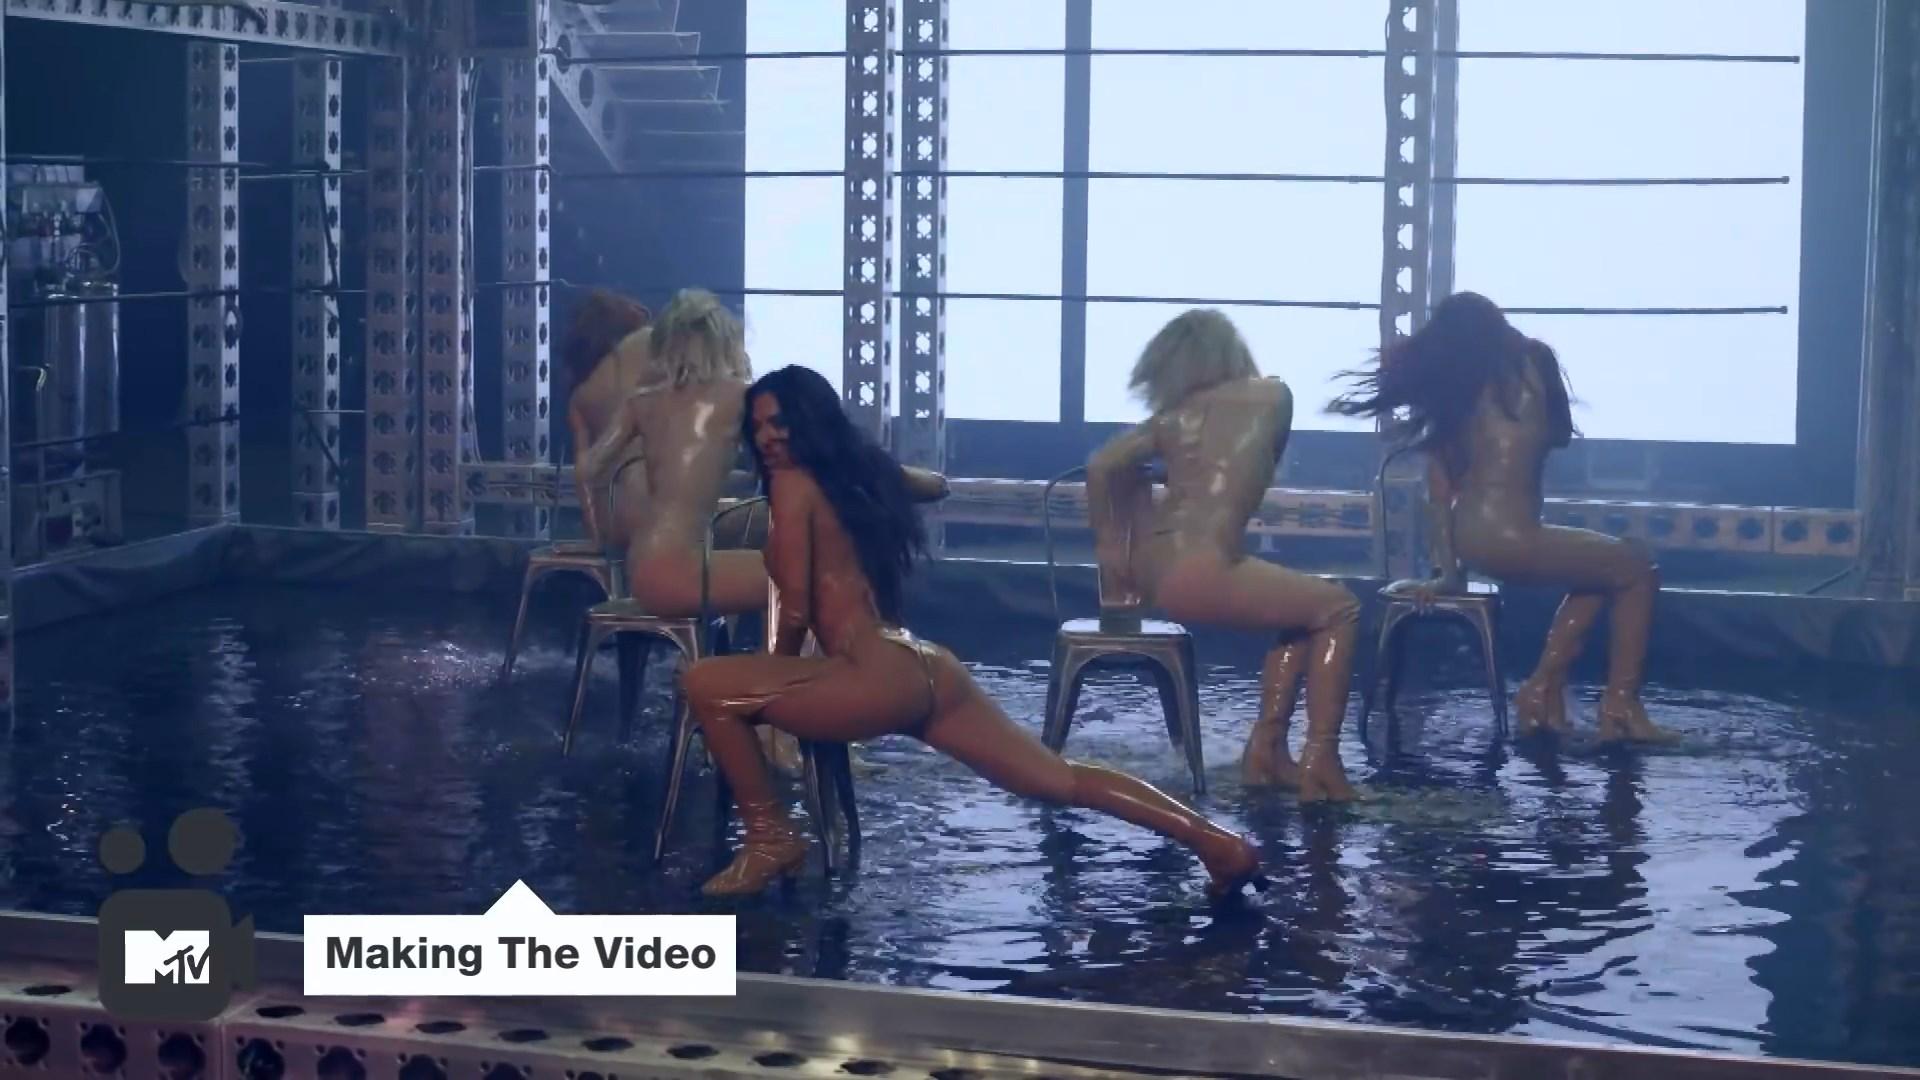 Pussycat Dolls 'React'  Making The Video ¦ MTV Music.mp4_snapshot_02.50_[2020.02.10_04.49.04].jpg